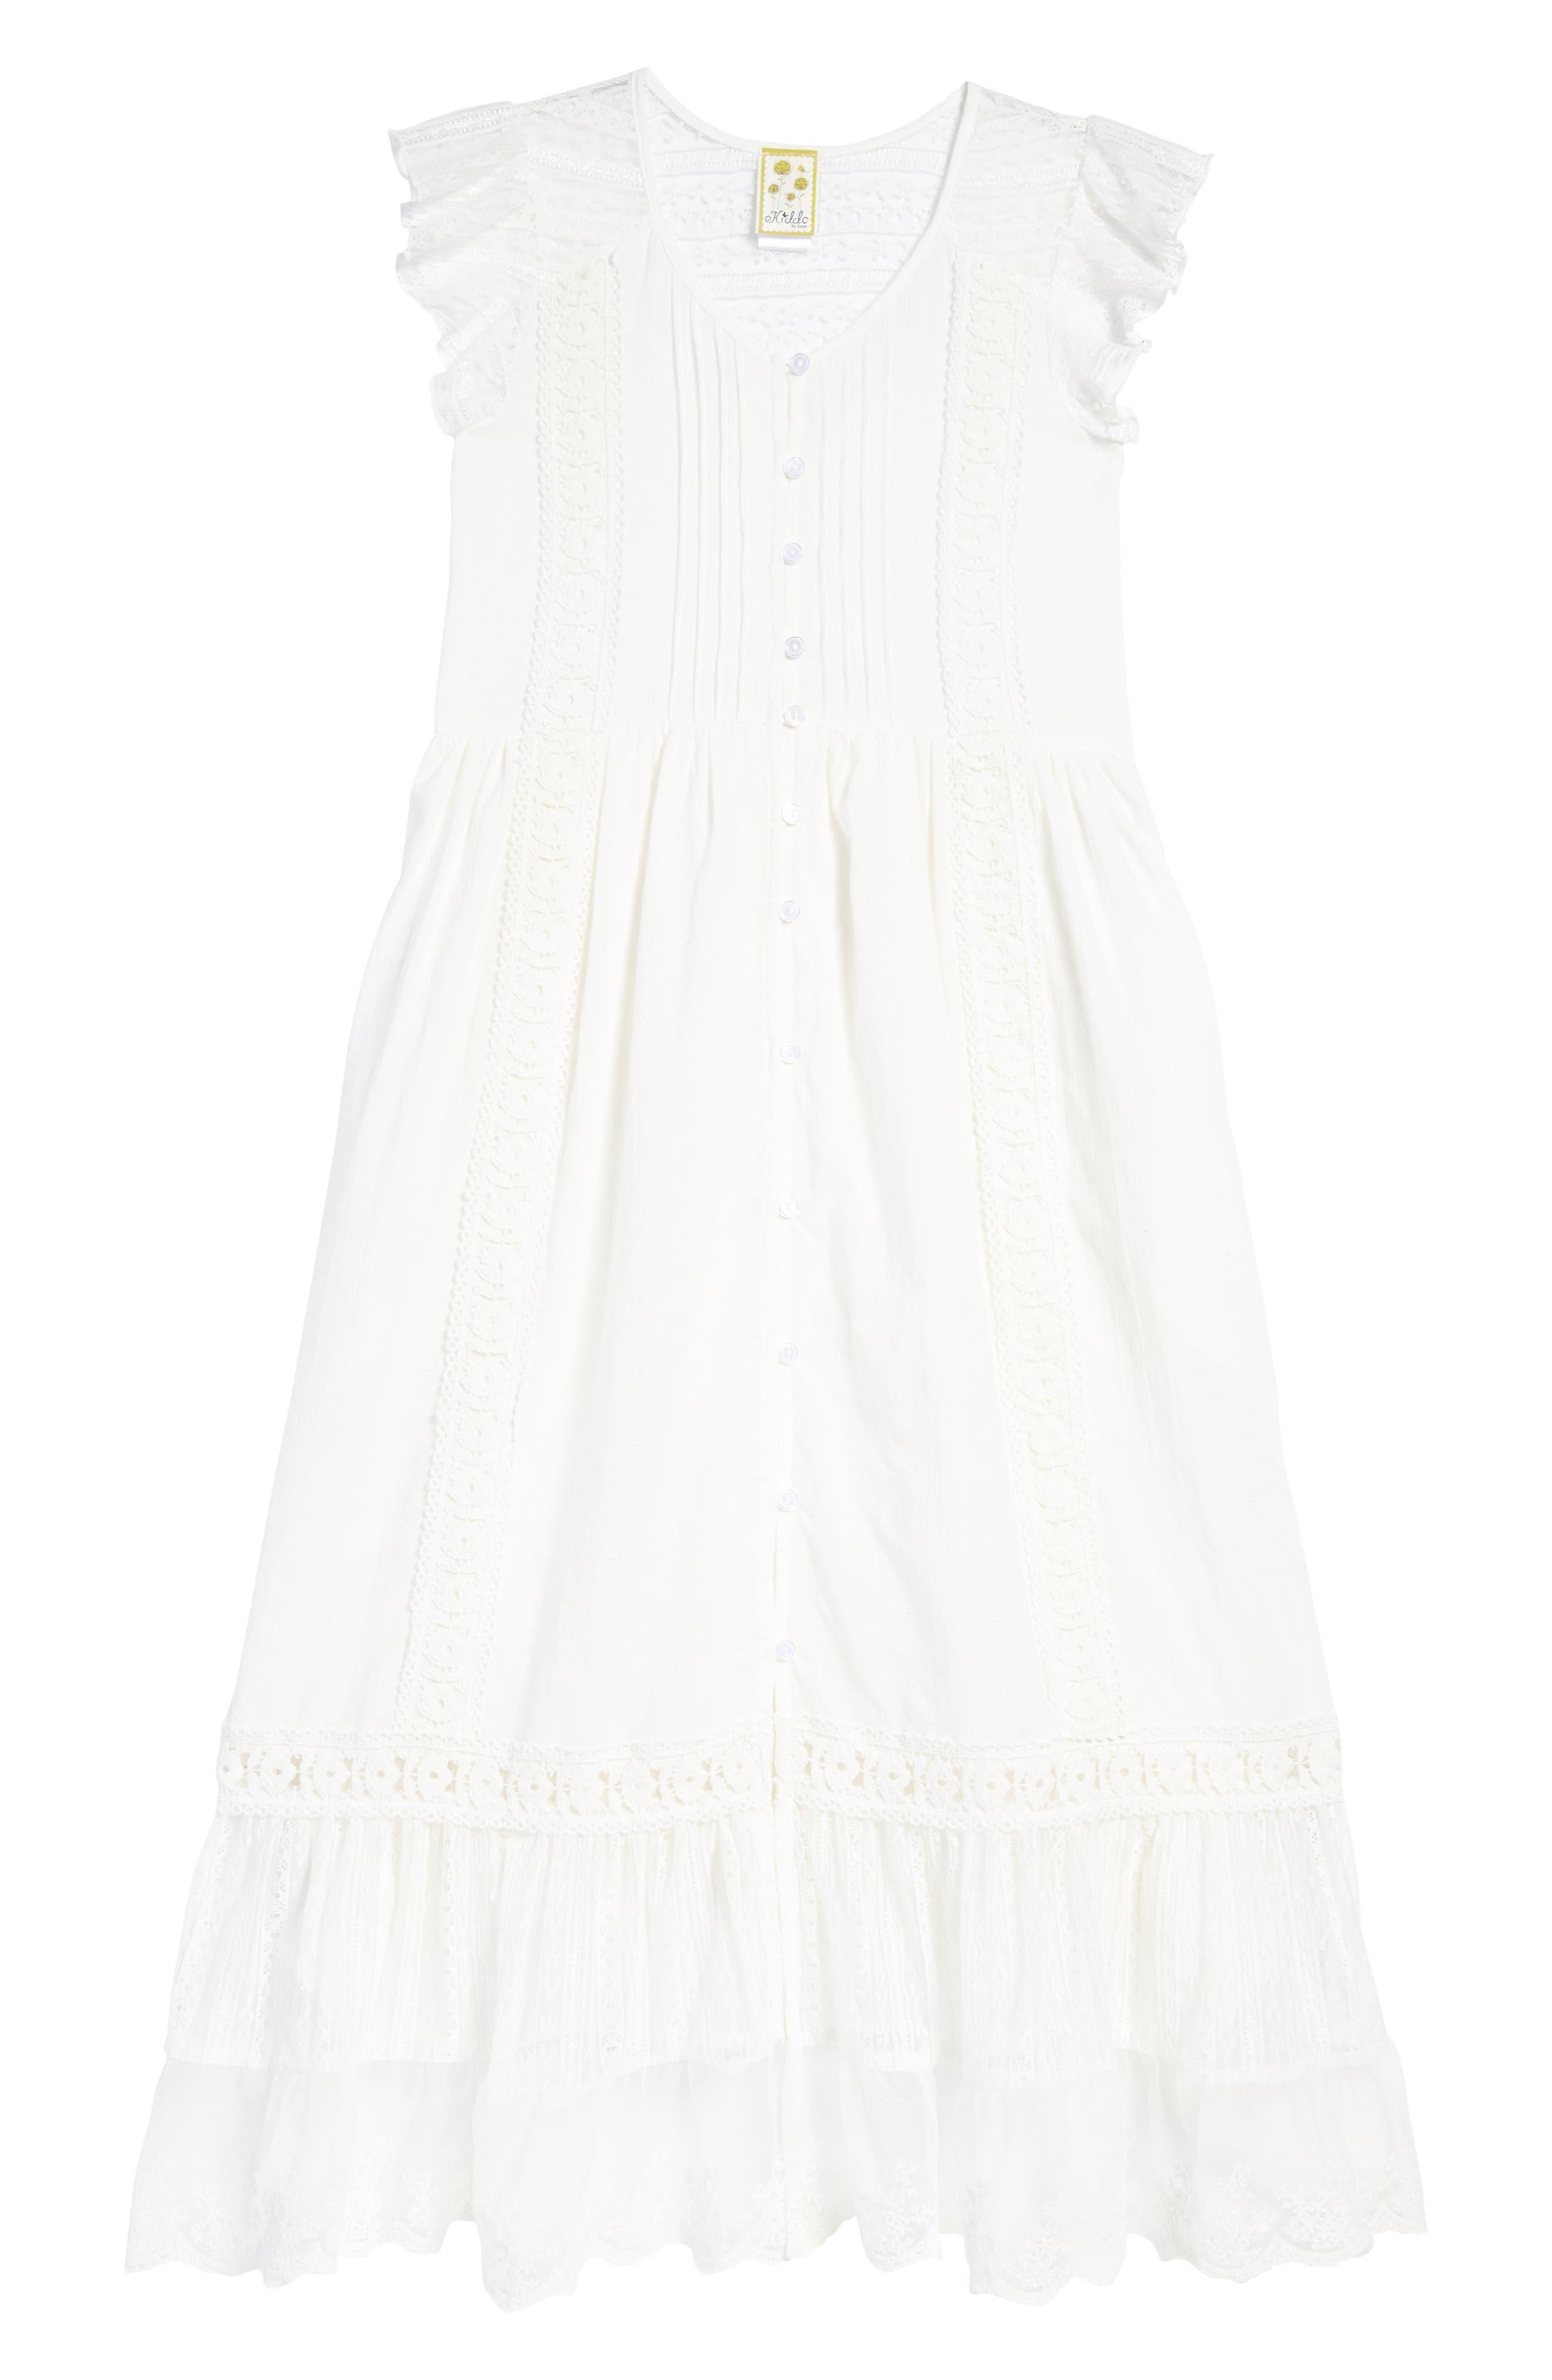 Main Image - Kiddo Lace Trim Maxi Dress (Big Girls)